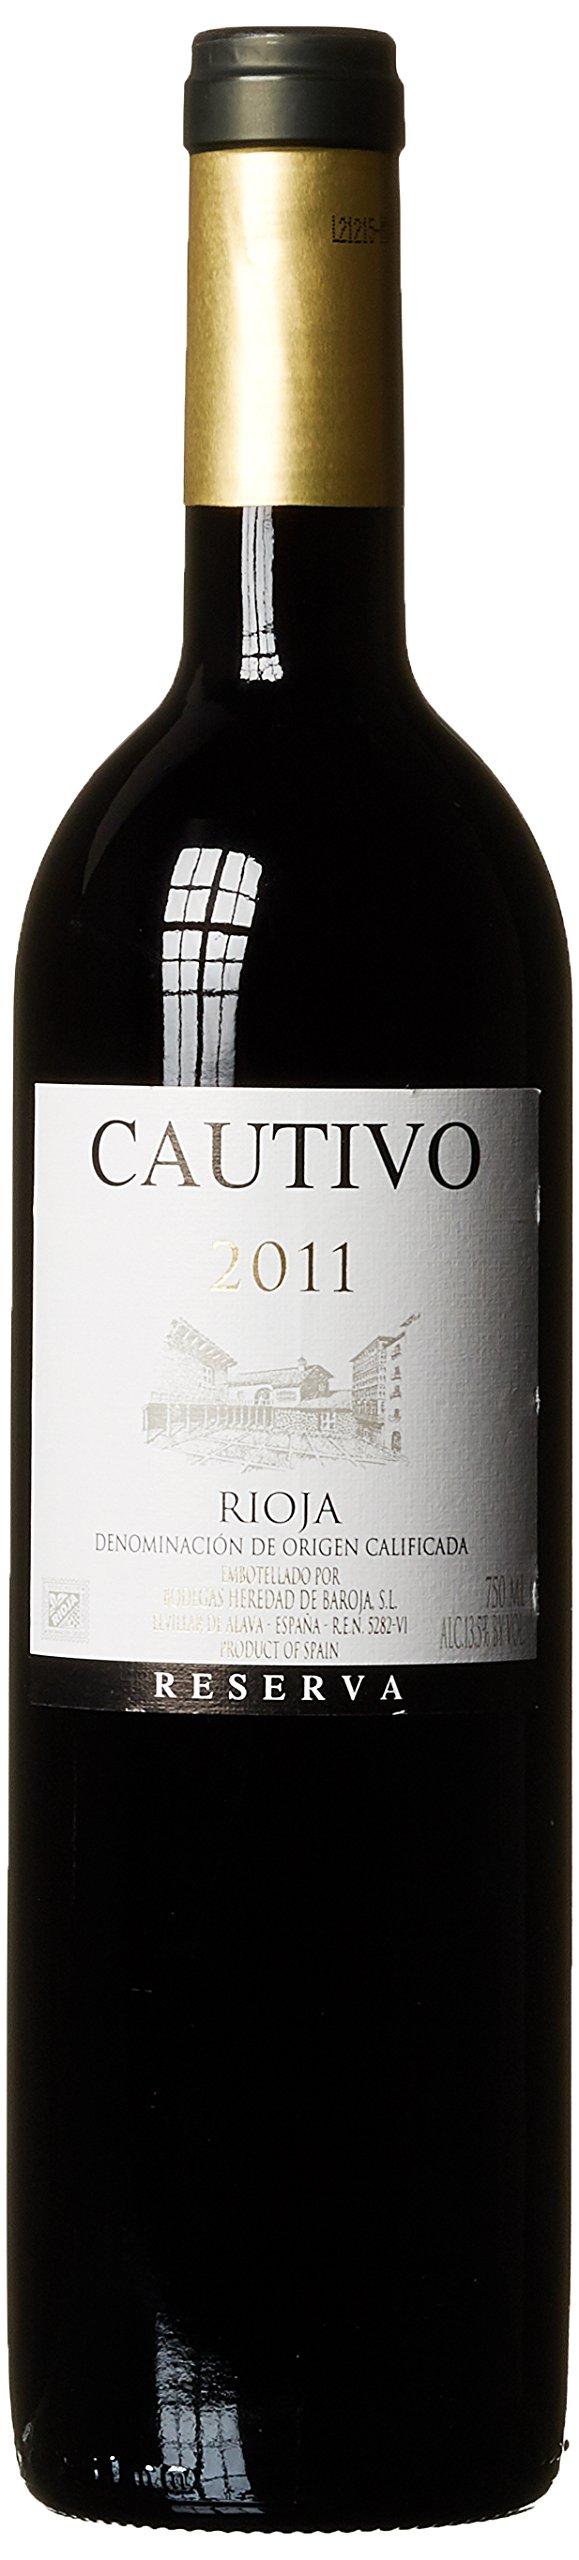 Bodegas-Heredad-de-Baroja-Cautivo-Rioja-Reserva-DOCa-Tempranillo-2011-Trocken-1-x-075-l